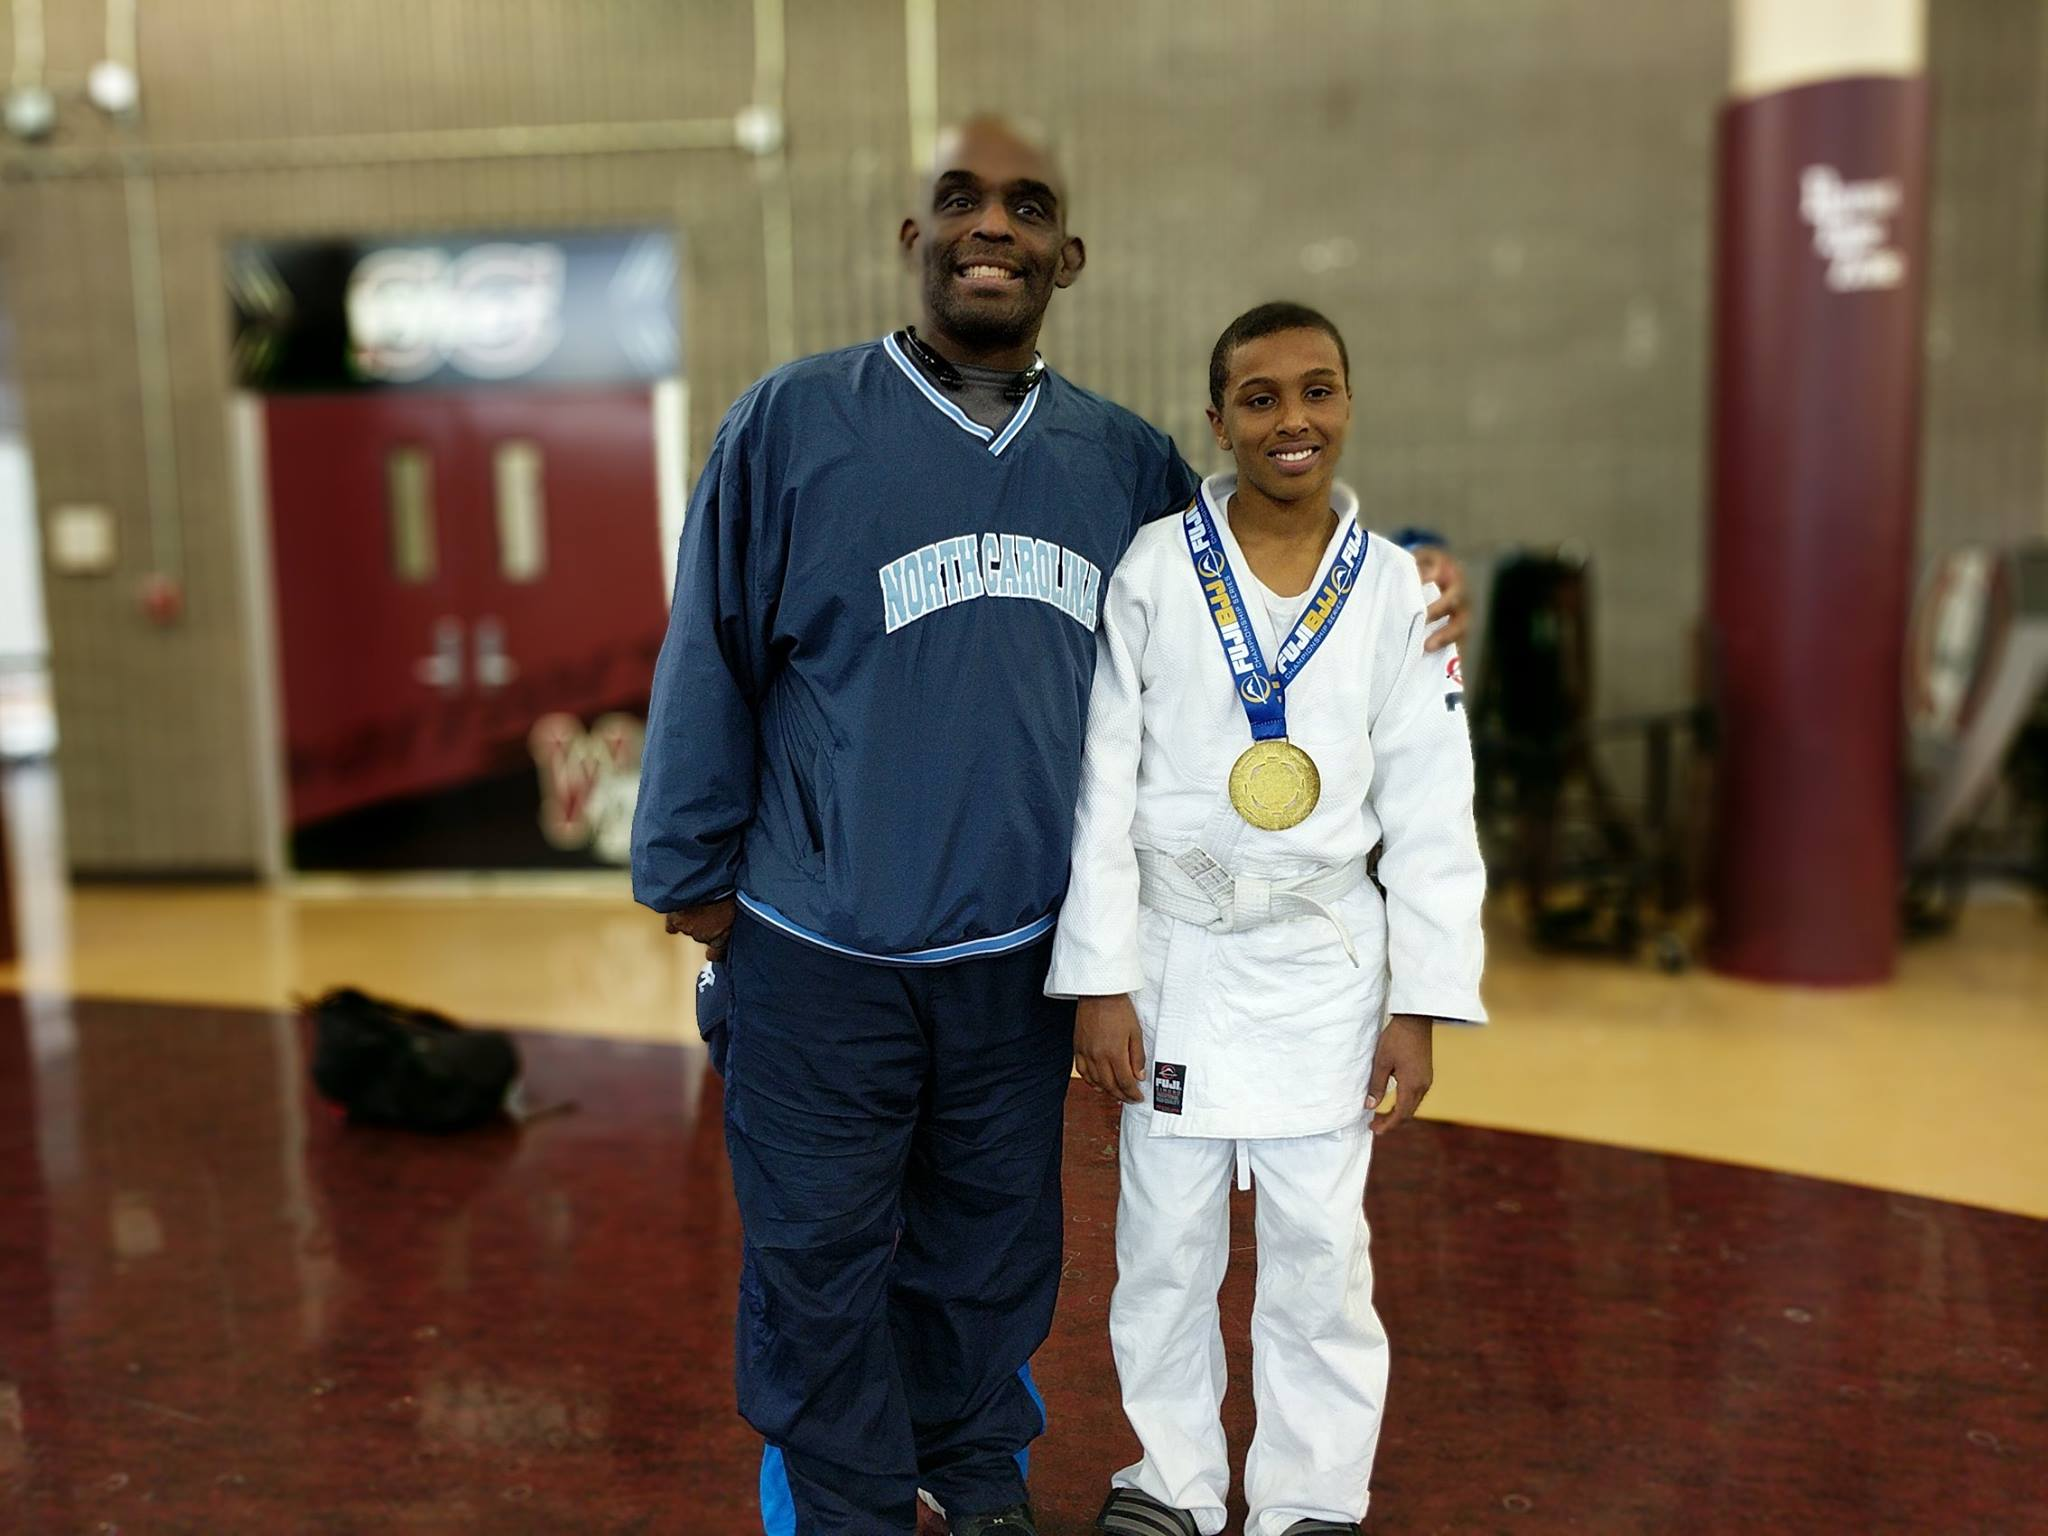 2017 FUJI BJJ Missouri State Jiu-jitsu Championships | White